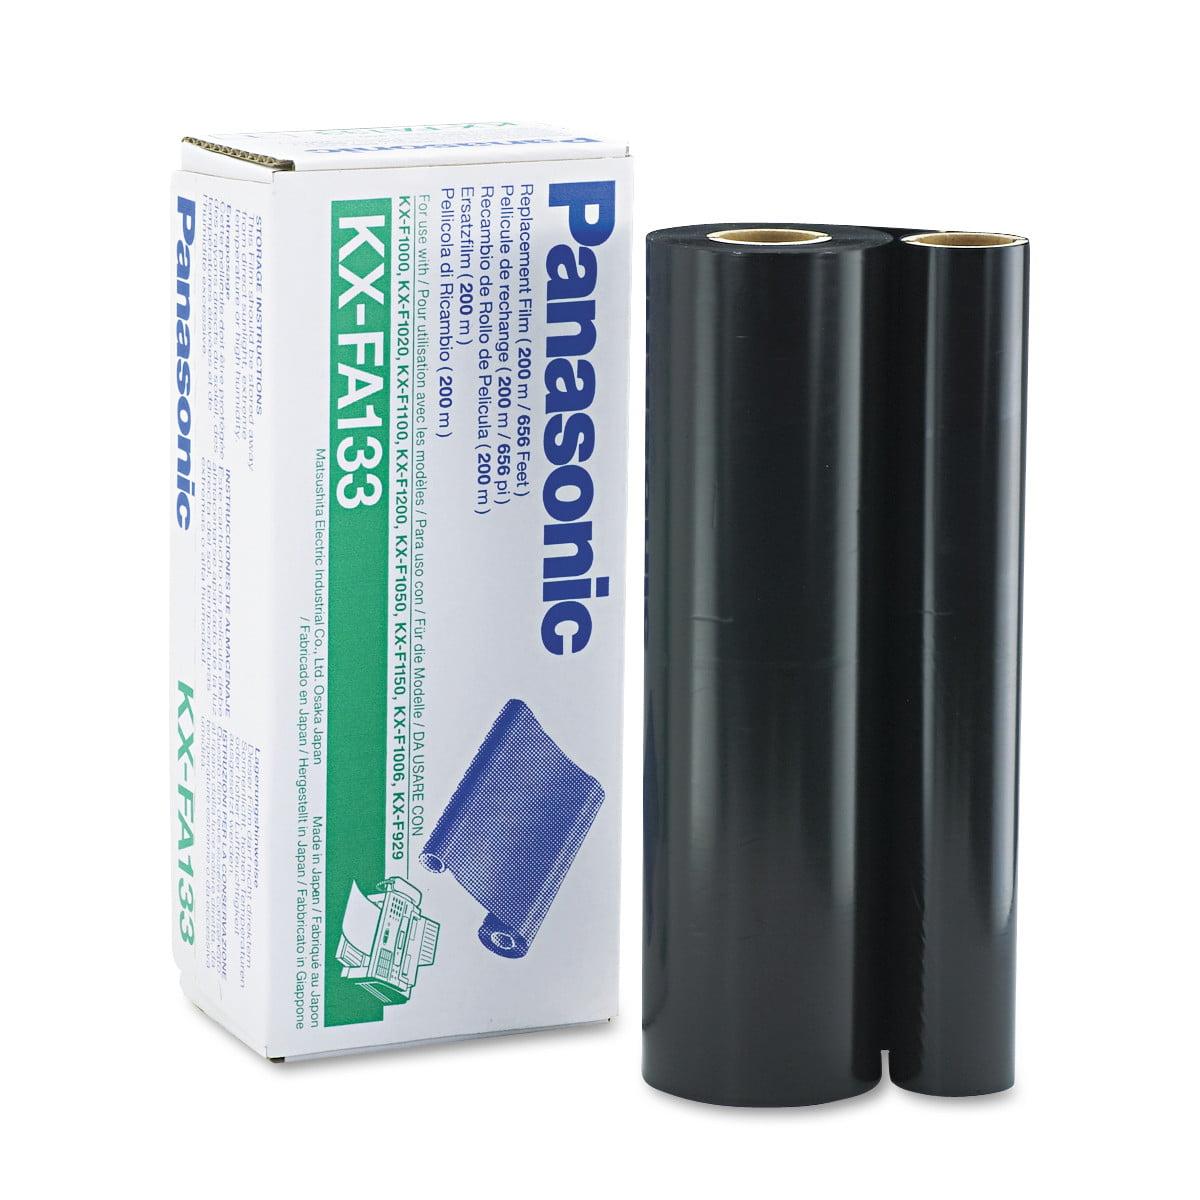 Panasonic KXFA133 Film Roll Refill